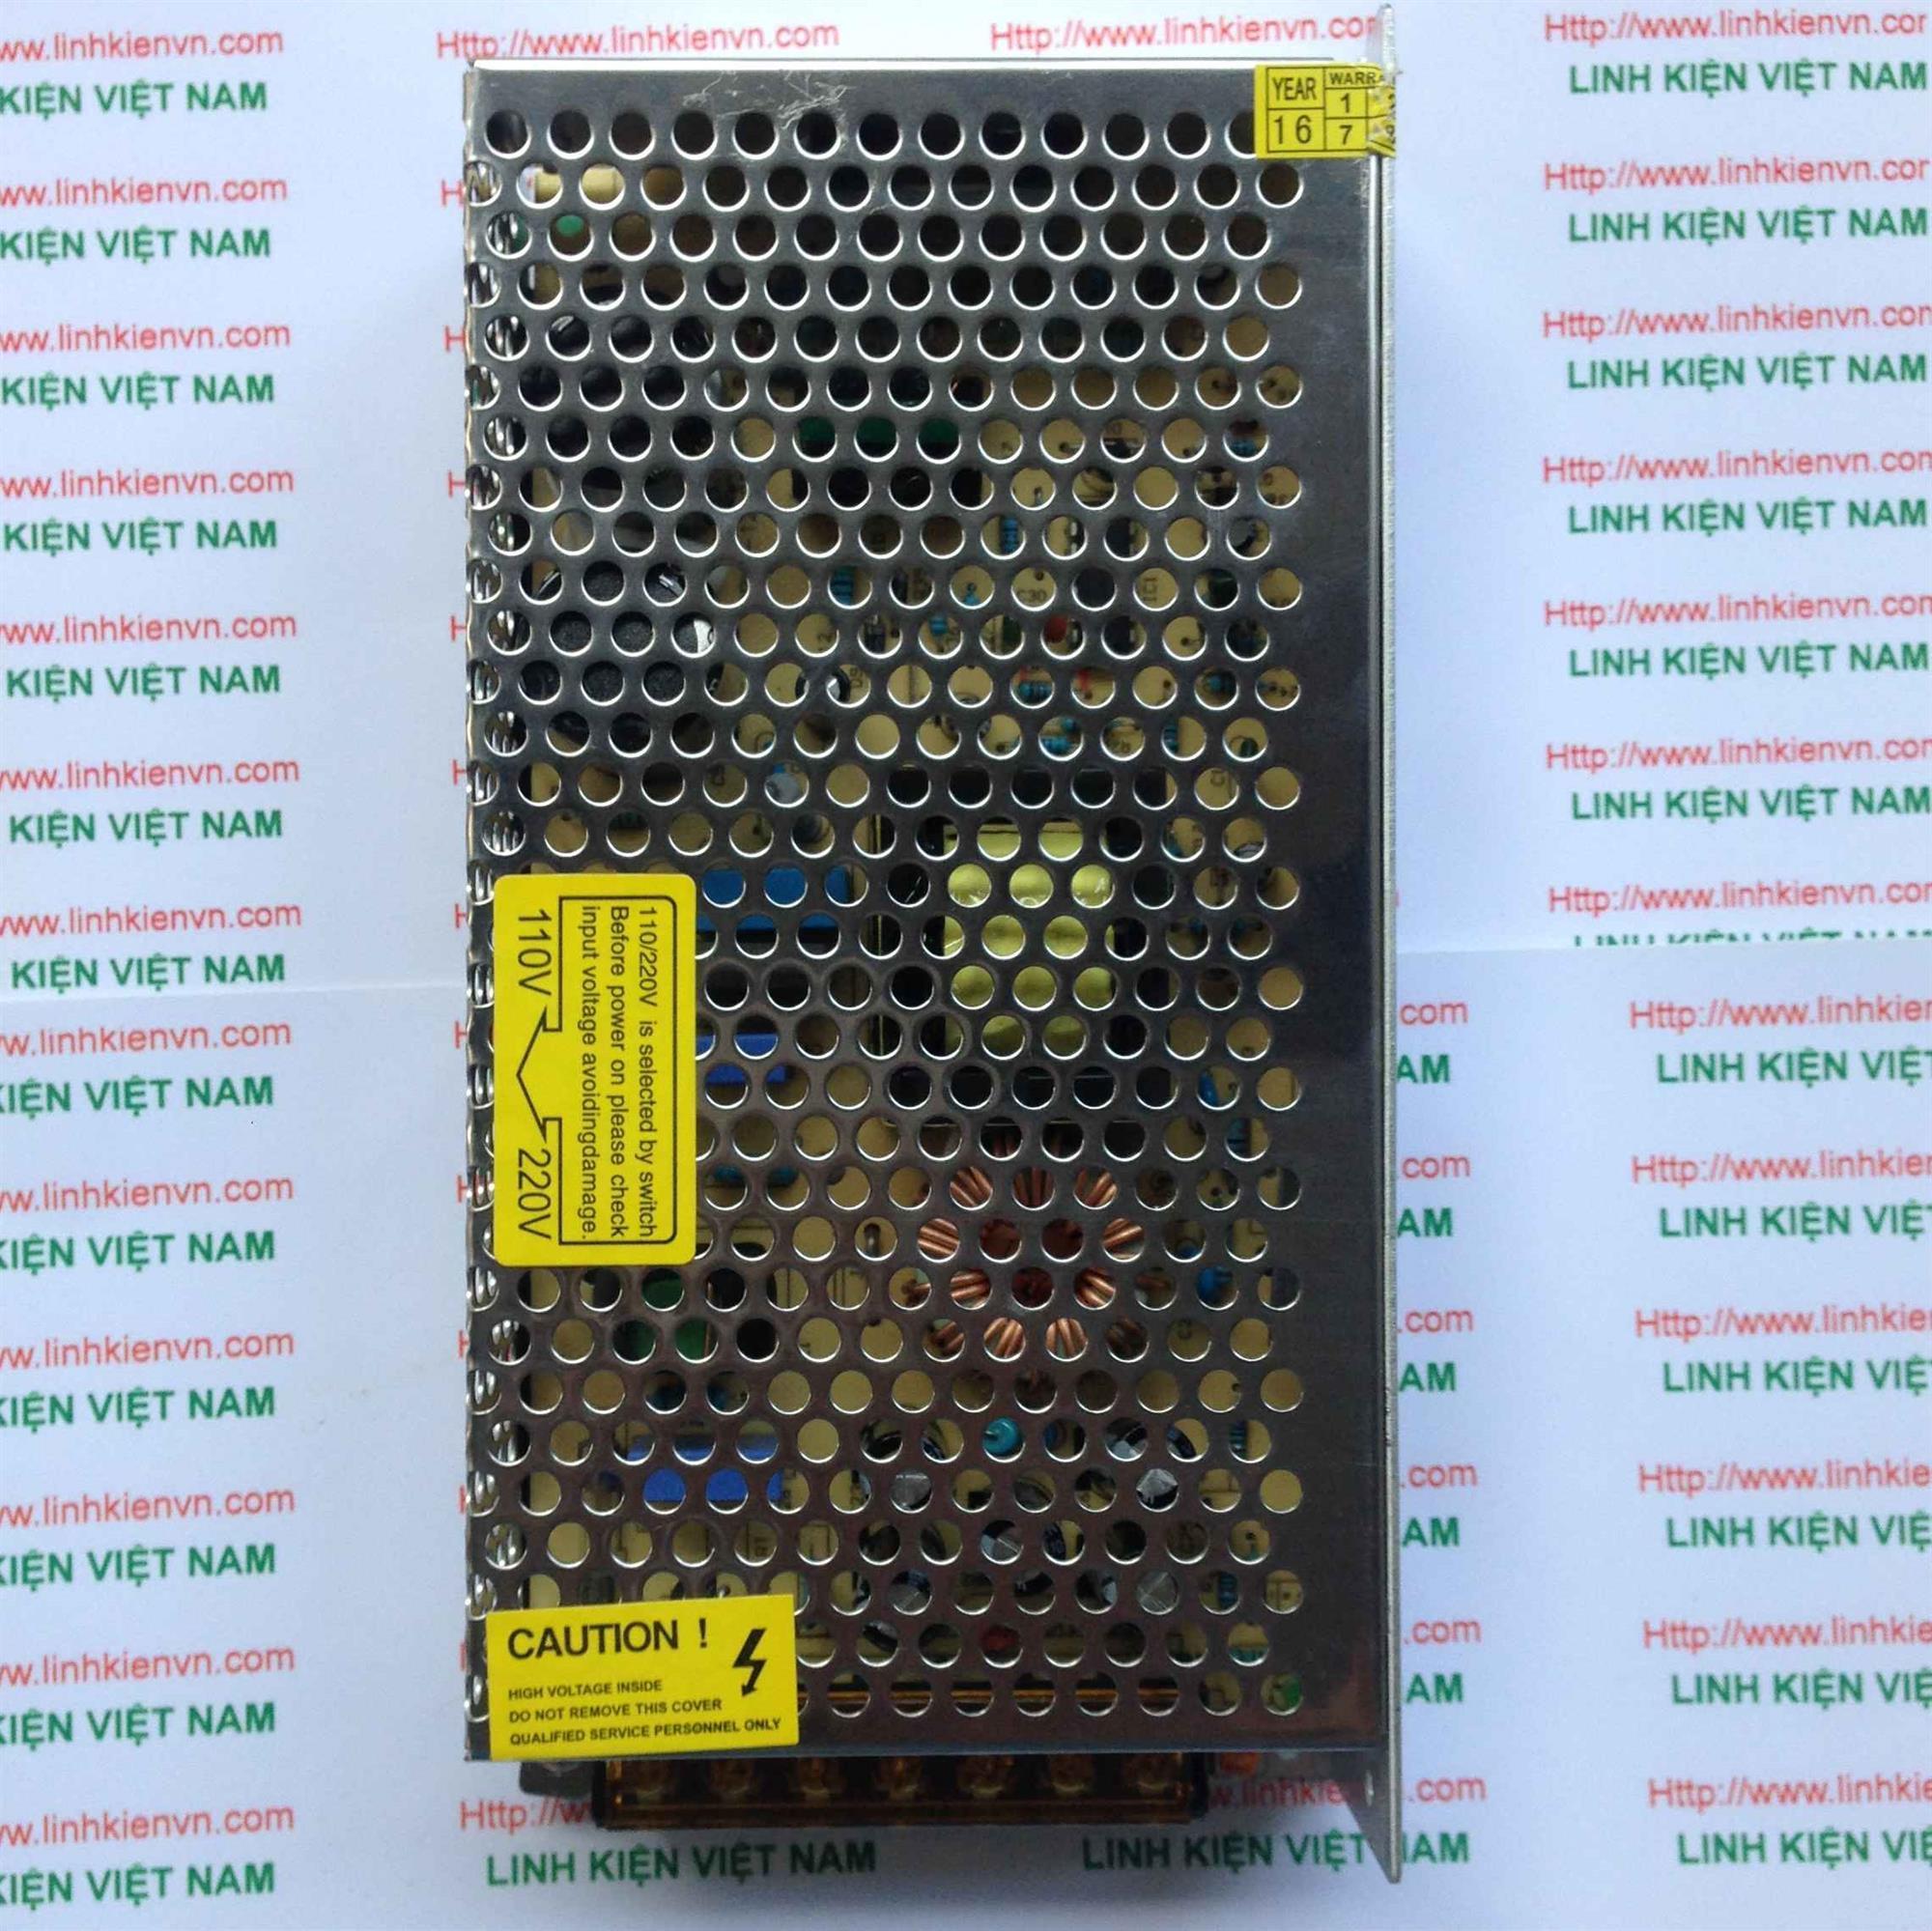 Nguồn tổ ong 5V 40A / Nguồn 5V 40A - Kho D